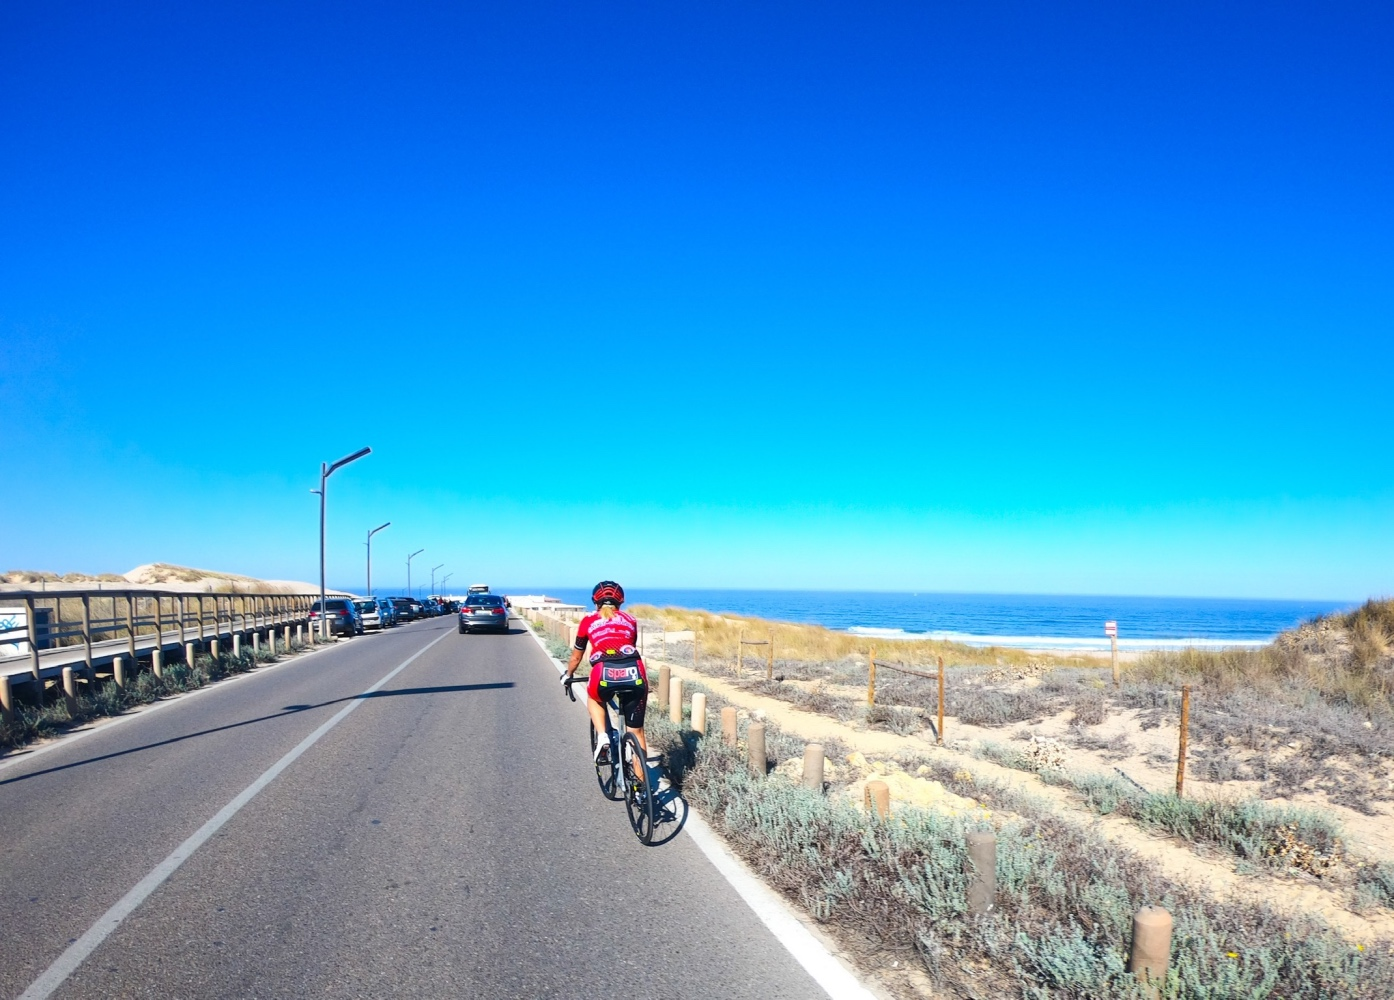 Road_Cycling, Sintra_Cascais2_Rentals.jpg